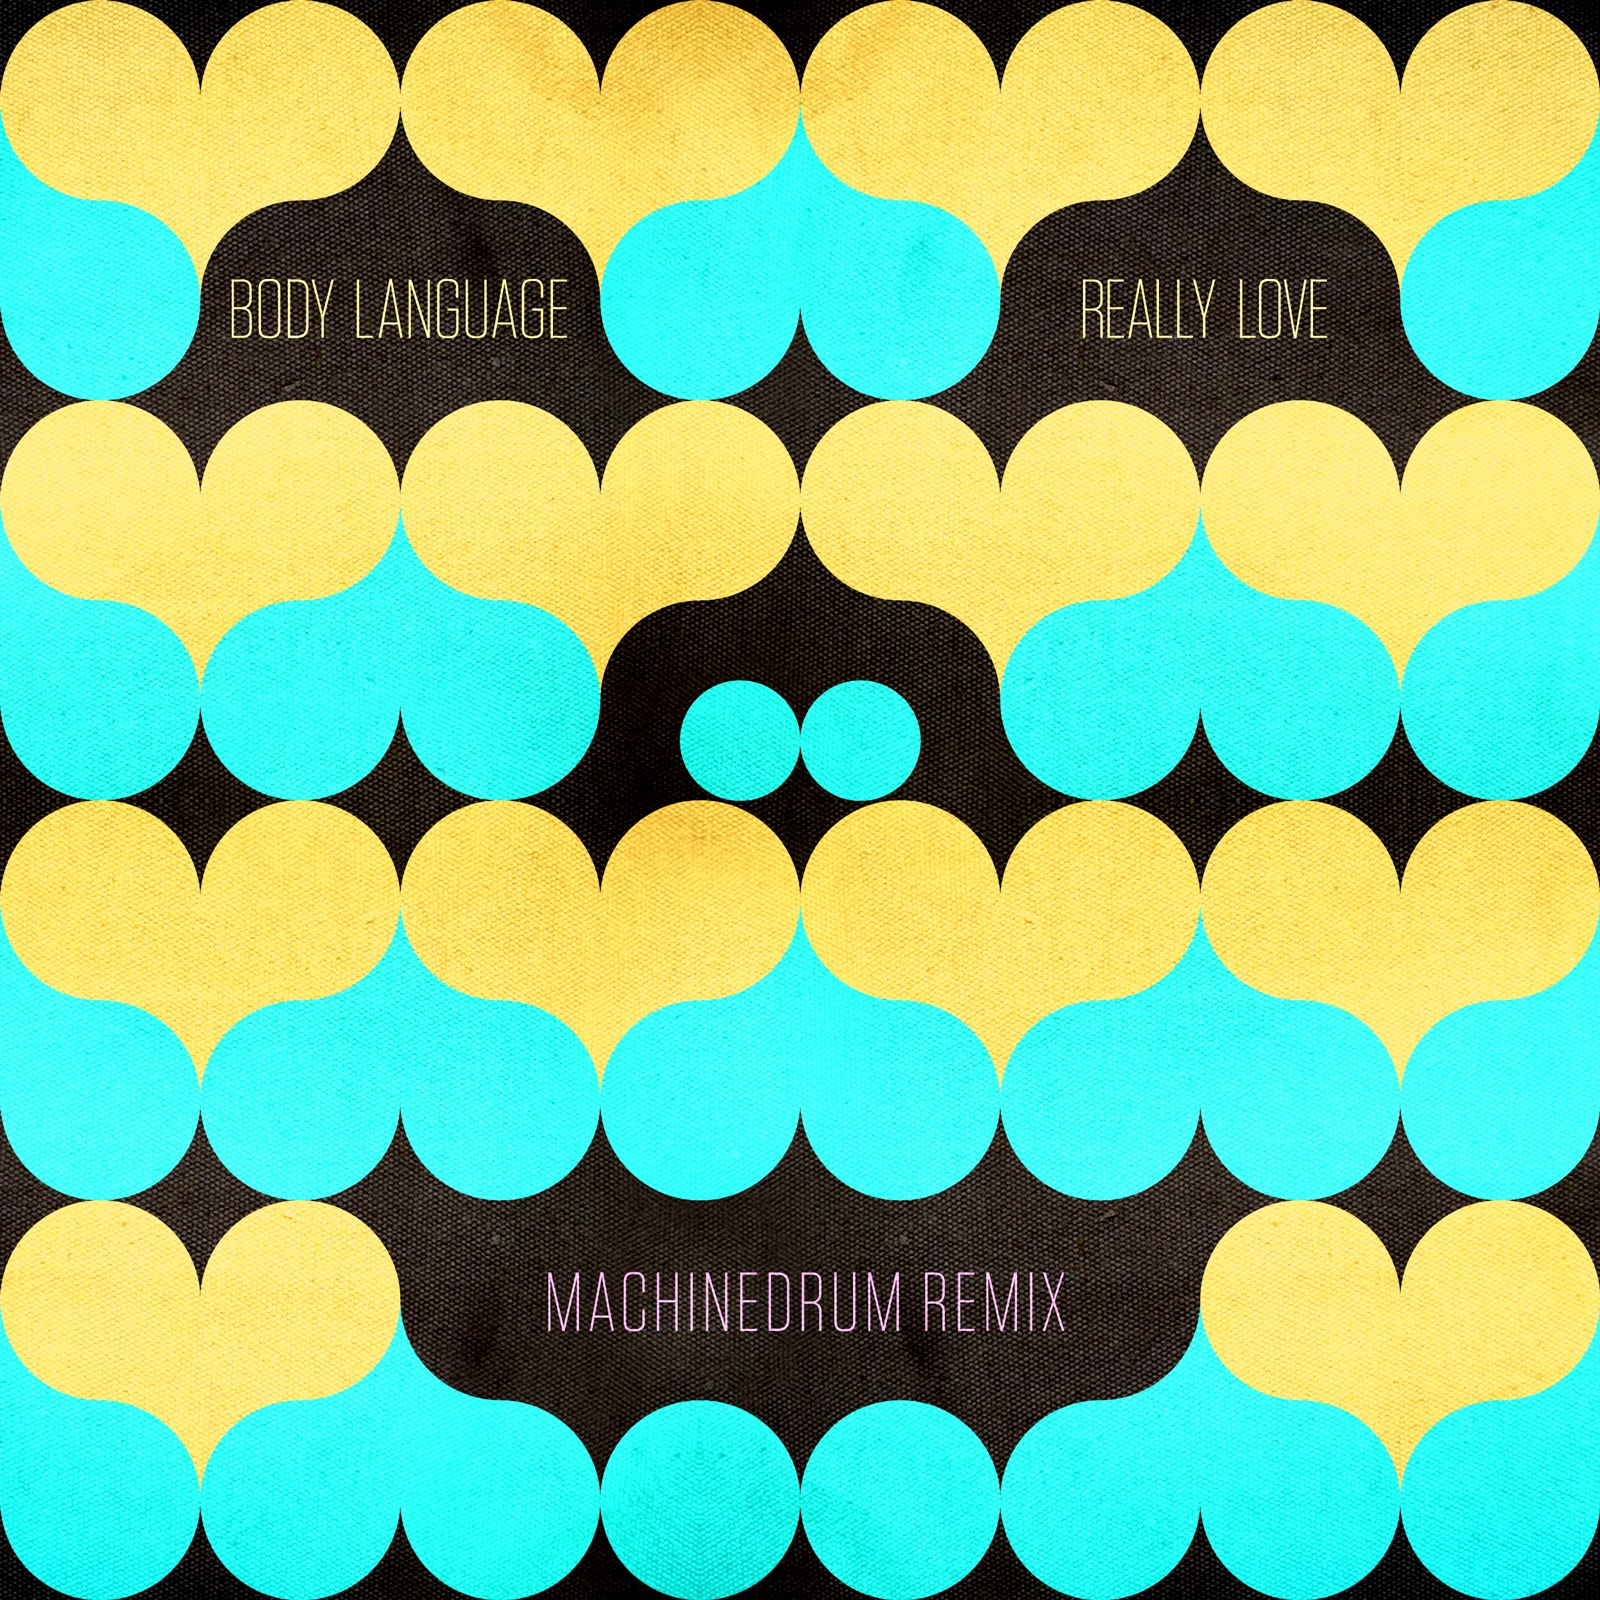 Really Love (Machinedrum Remix) - Single